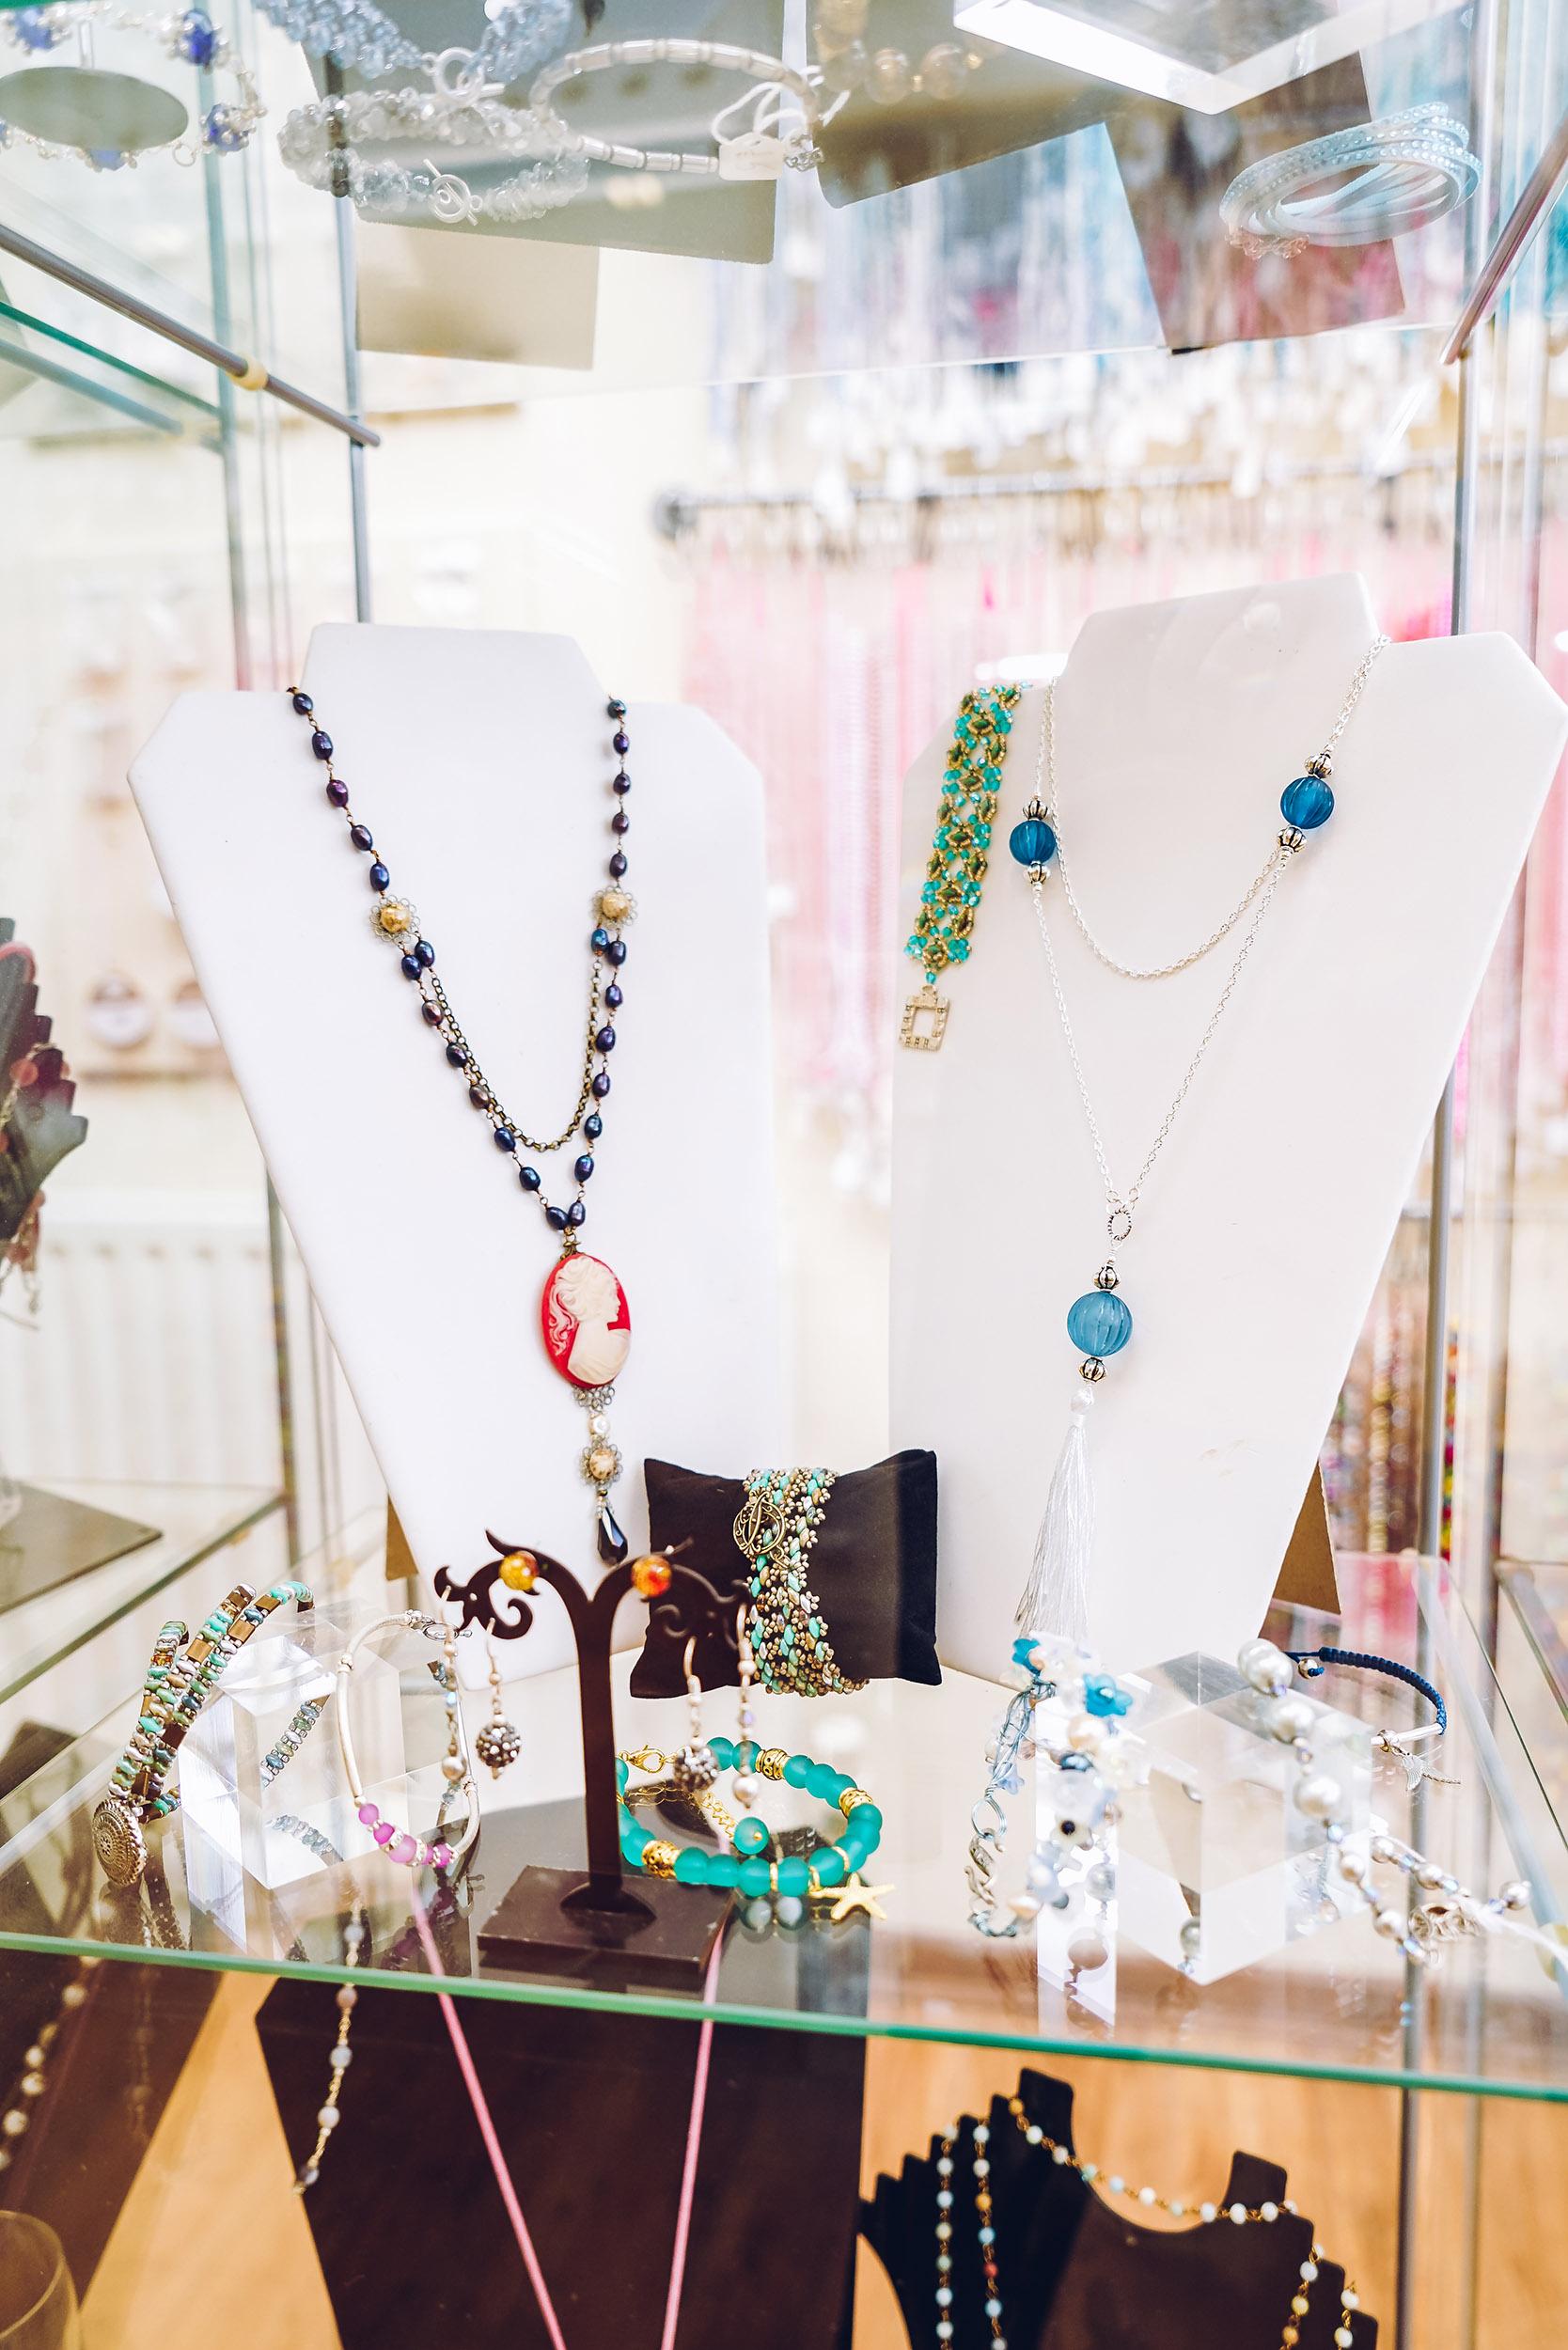 Deborah Beads - Colchester - Bead Shop 10.jpg